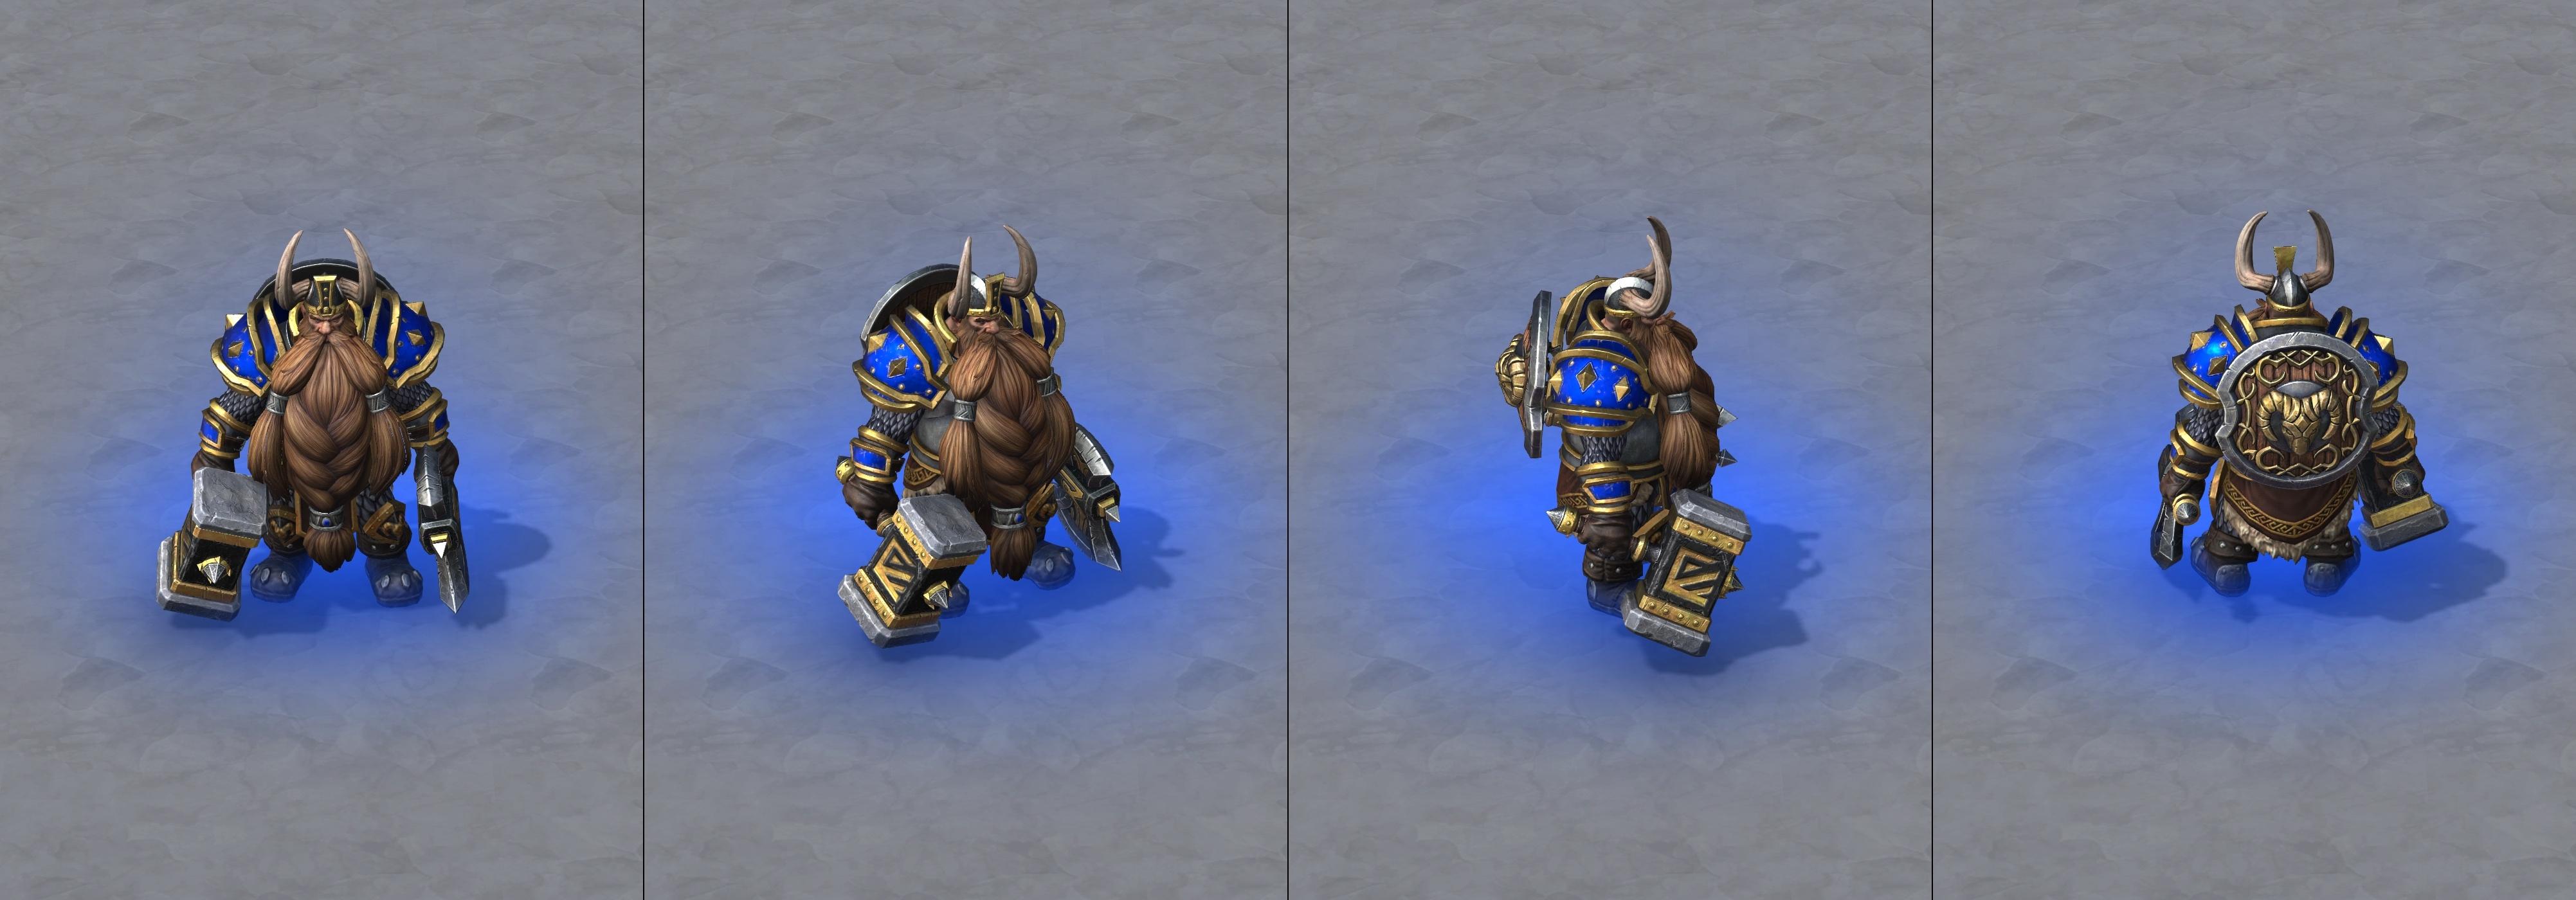 Warcraft III Reforged : Muradin Bronzebeard